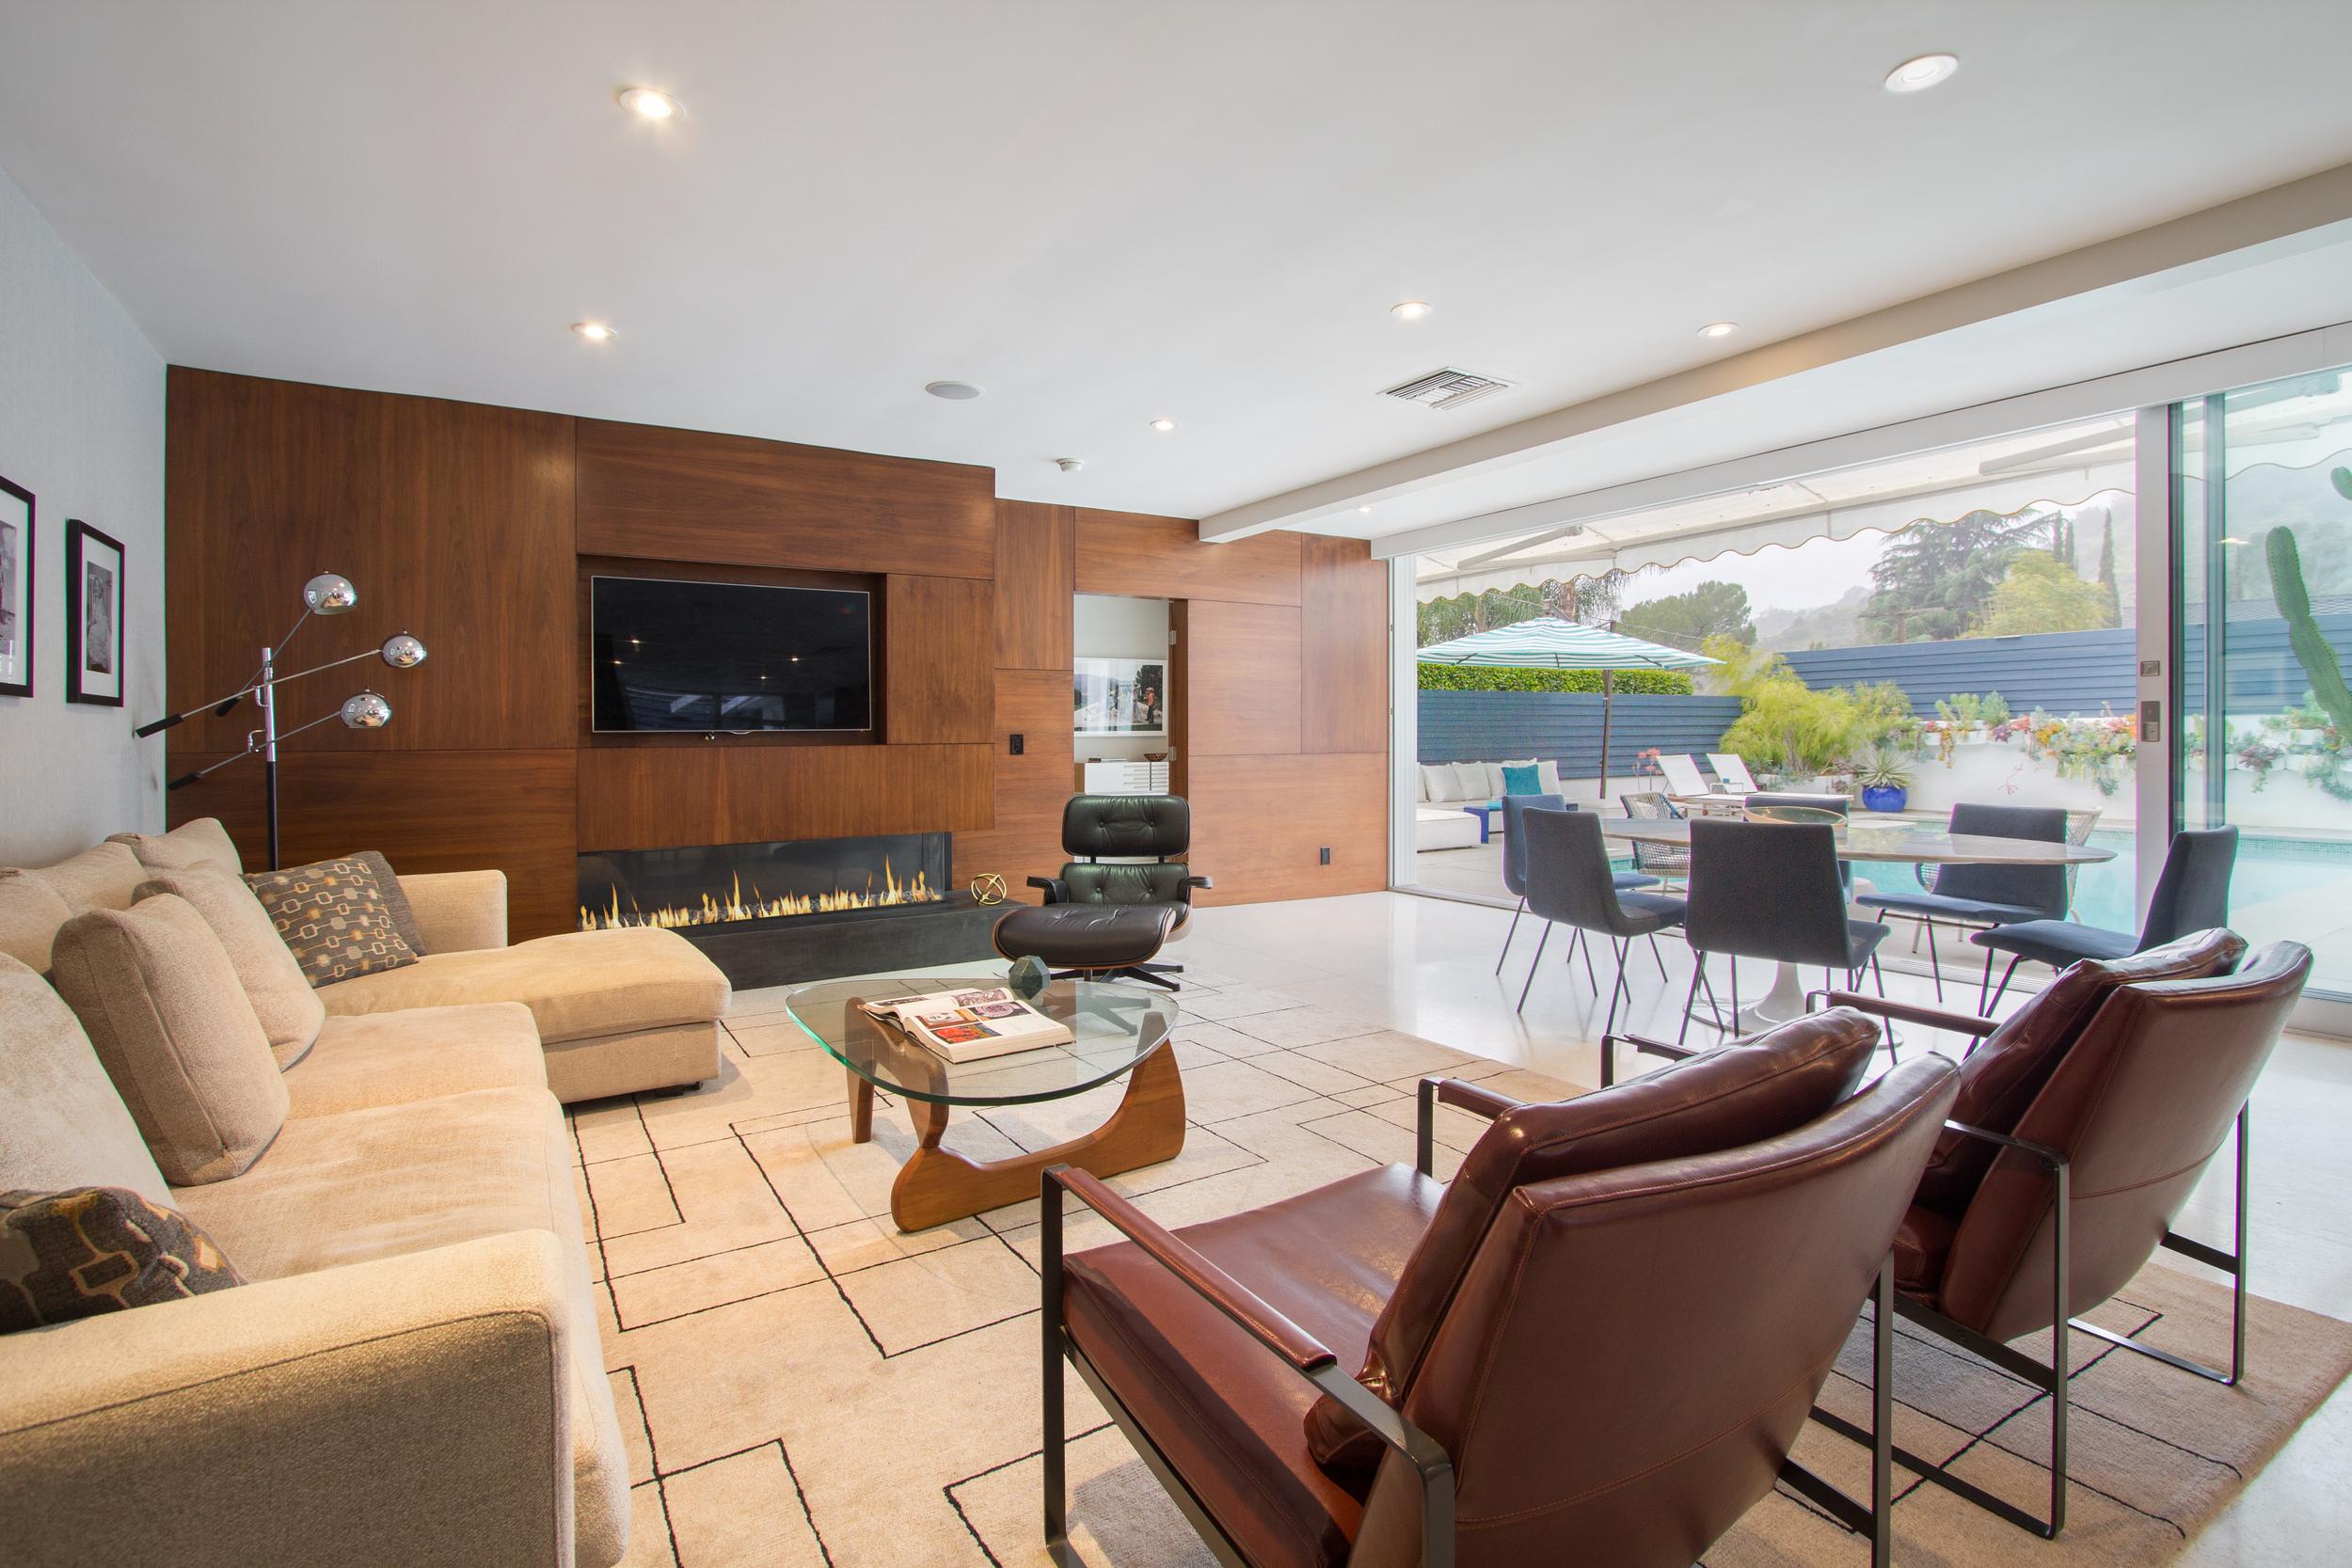 Beverly Hills - Remodel